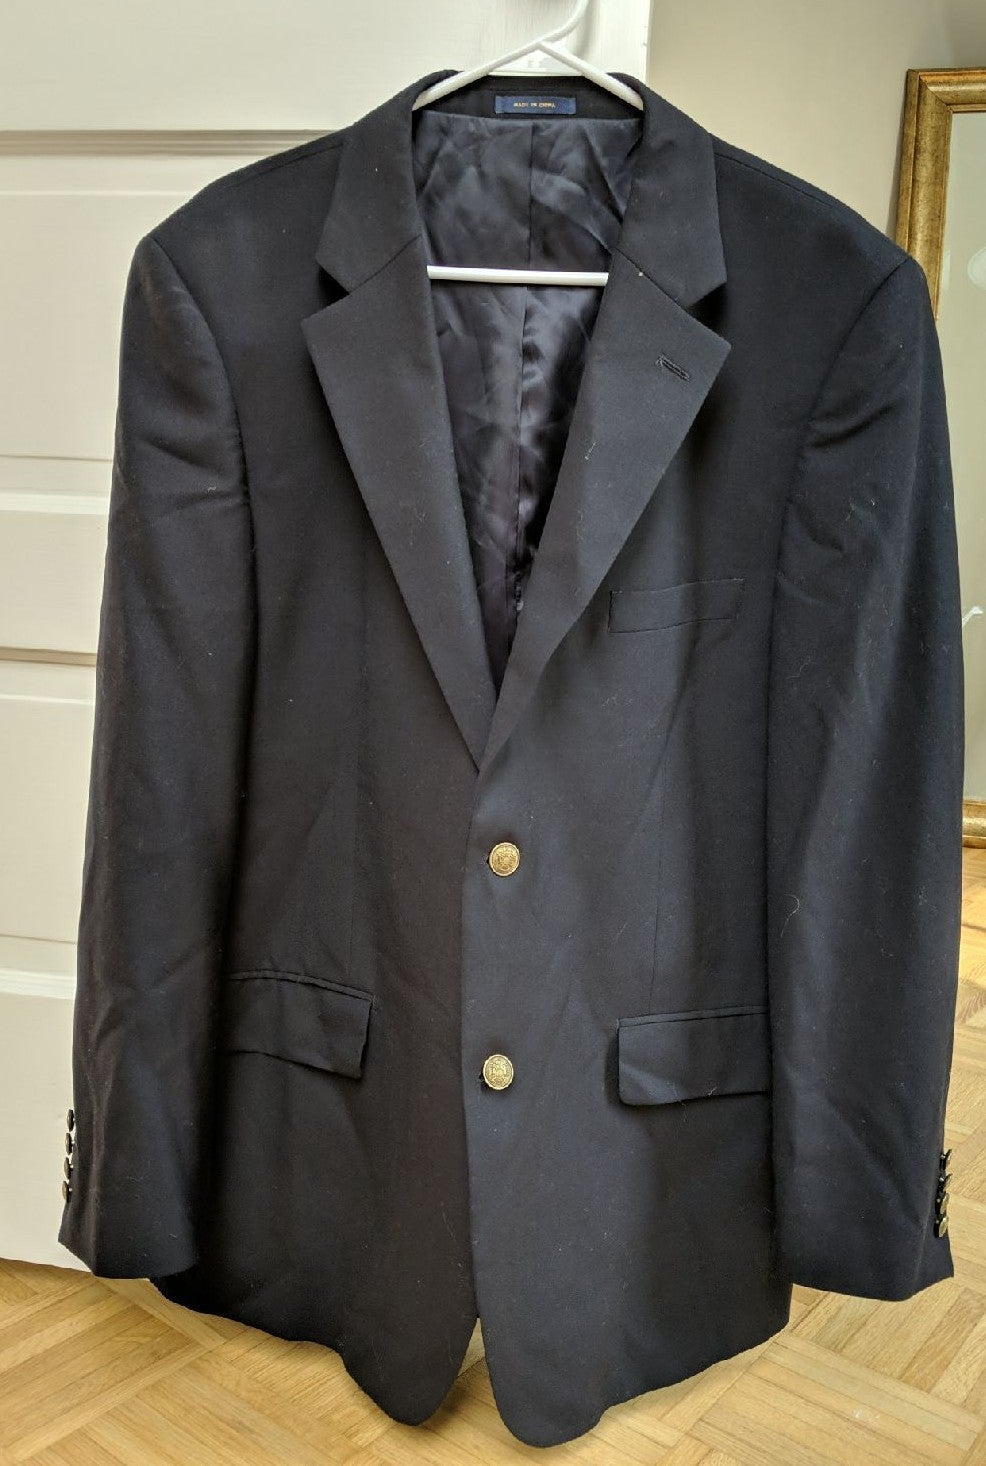 Navy Suit jacket 43R, clubroom